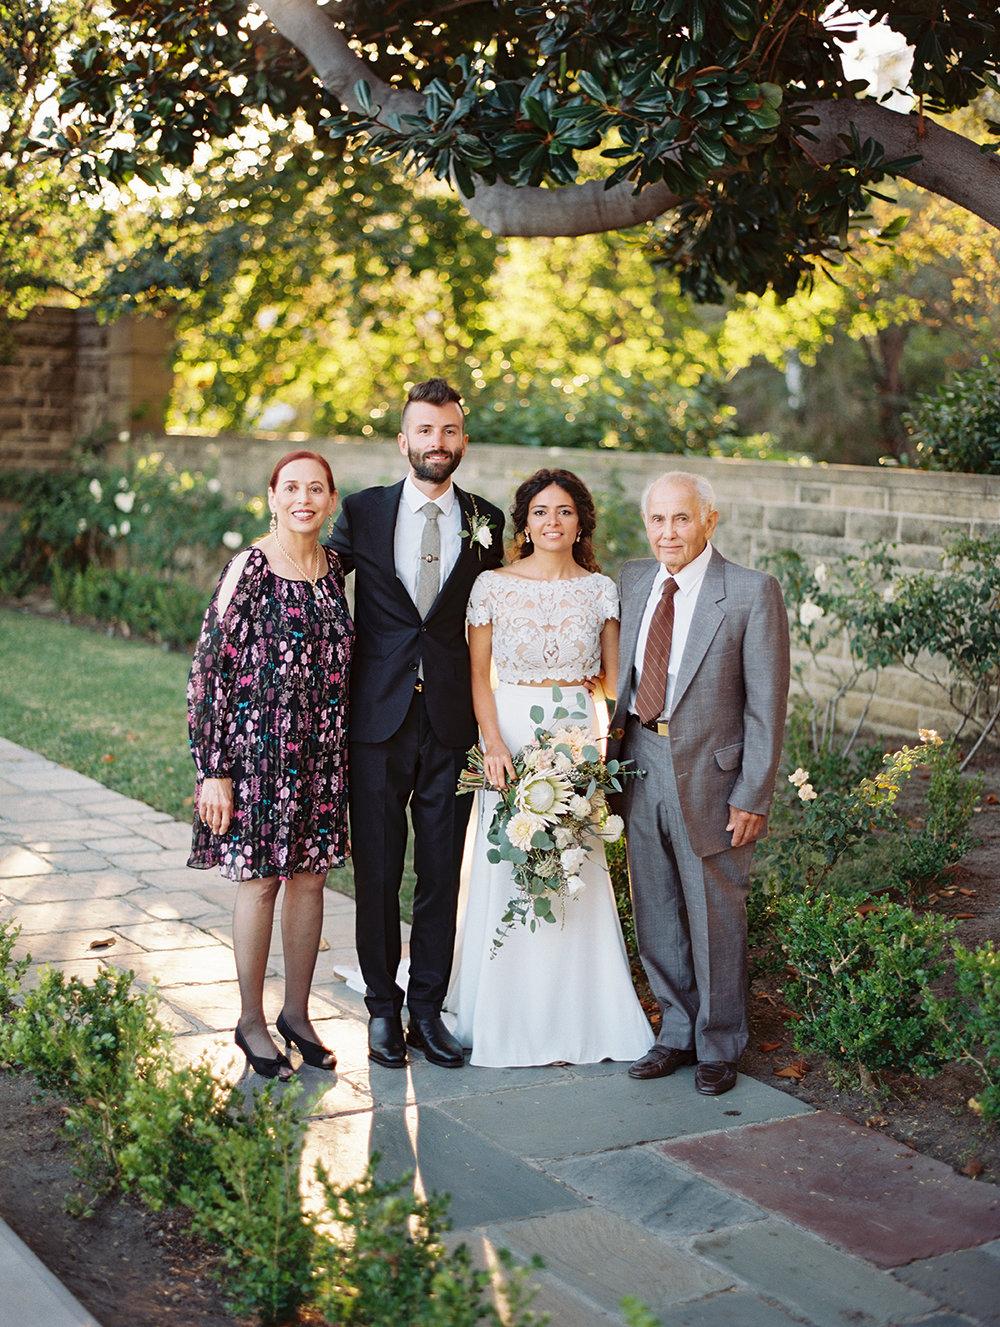 258-brian-sarra-los-angeles-wedding-brumley-wells-photography.jpg